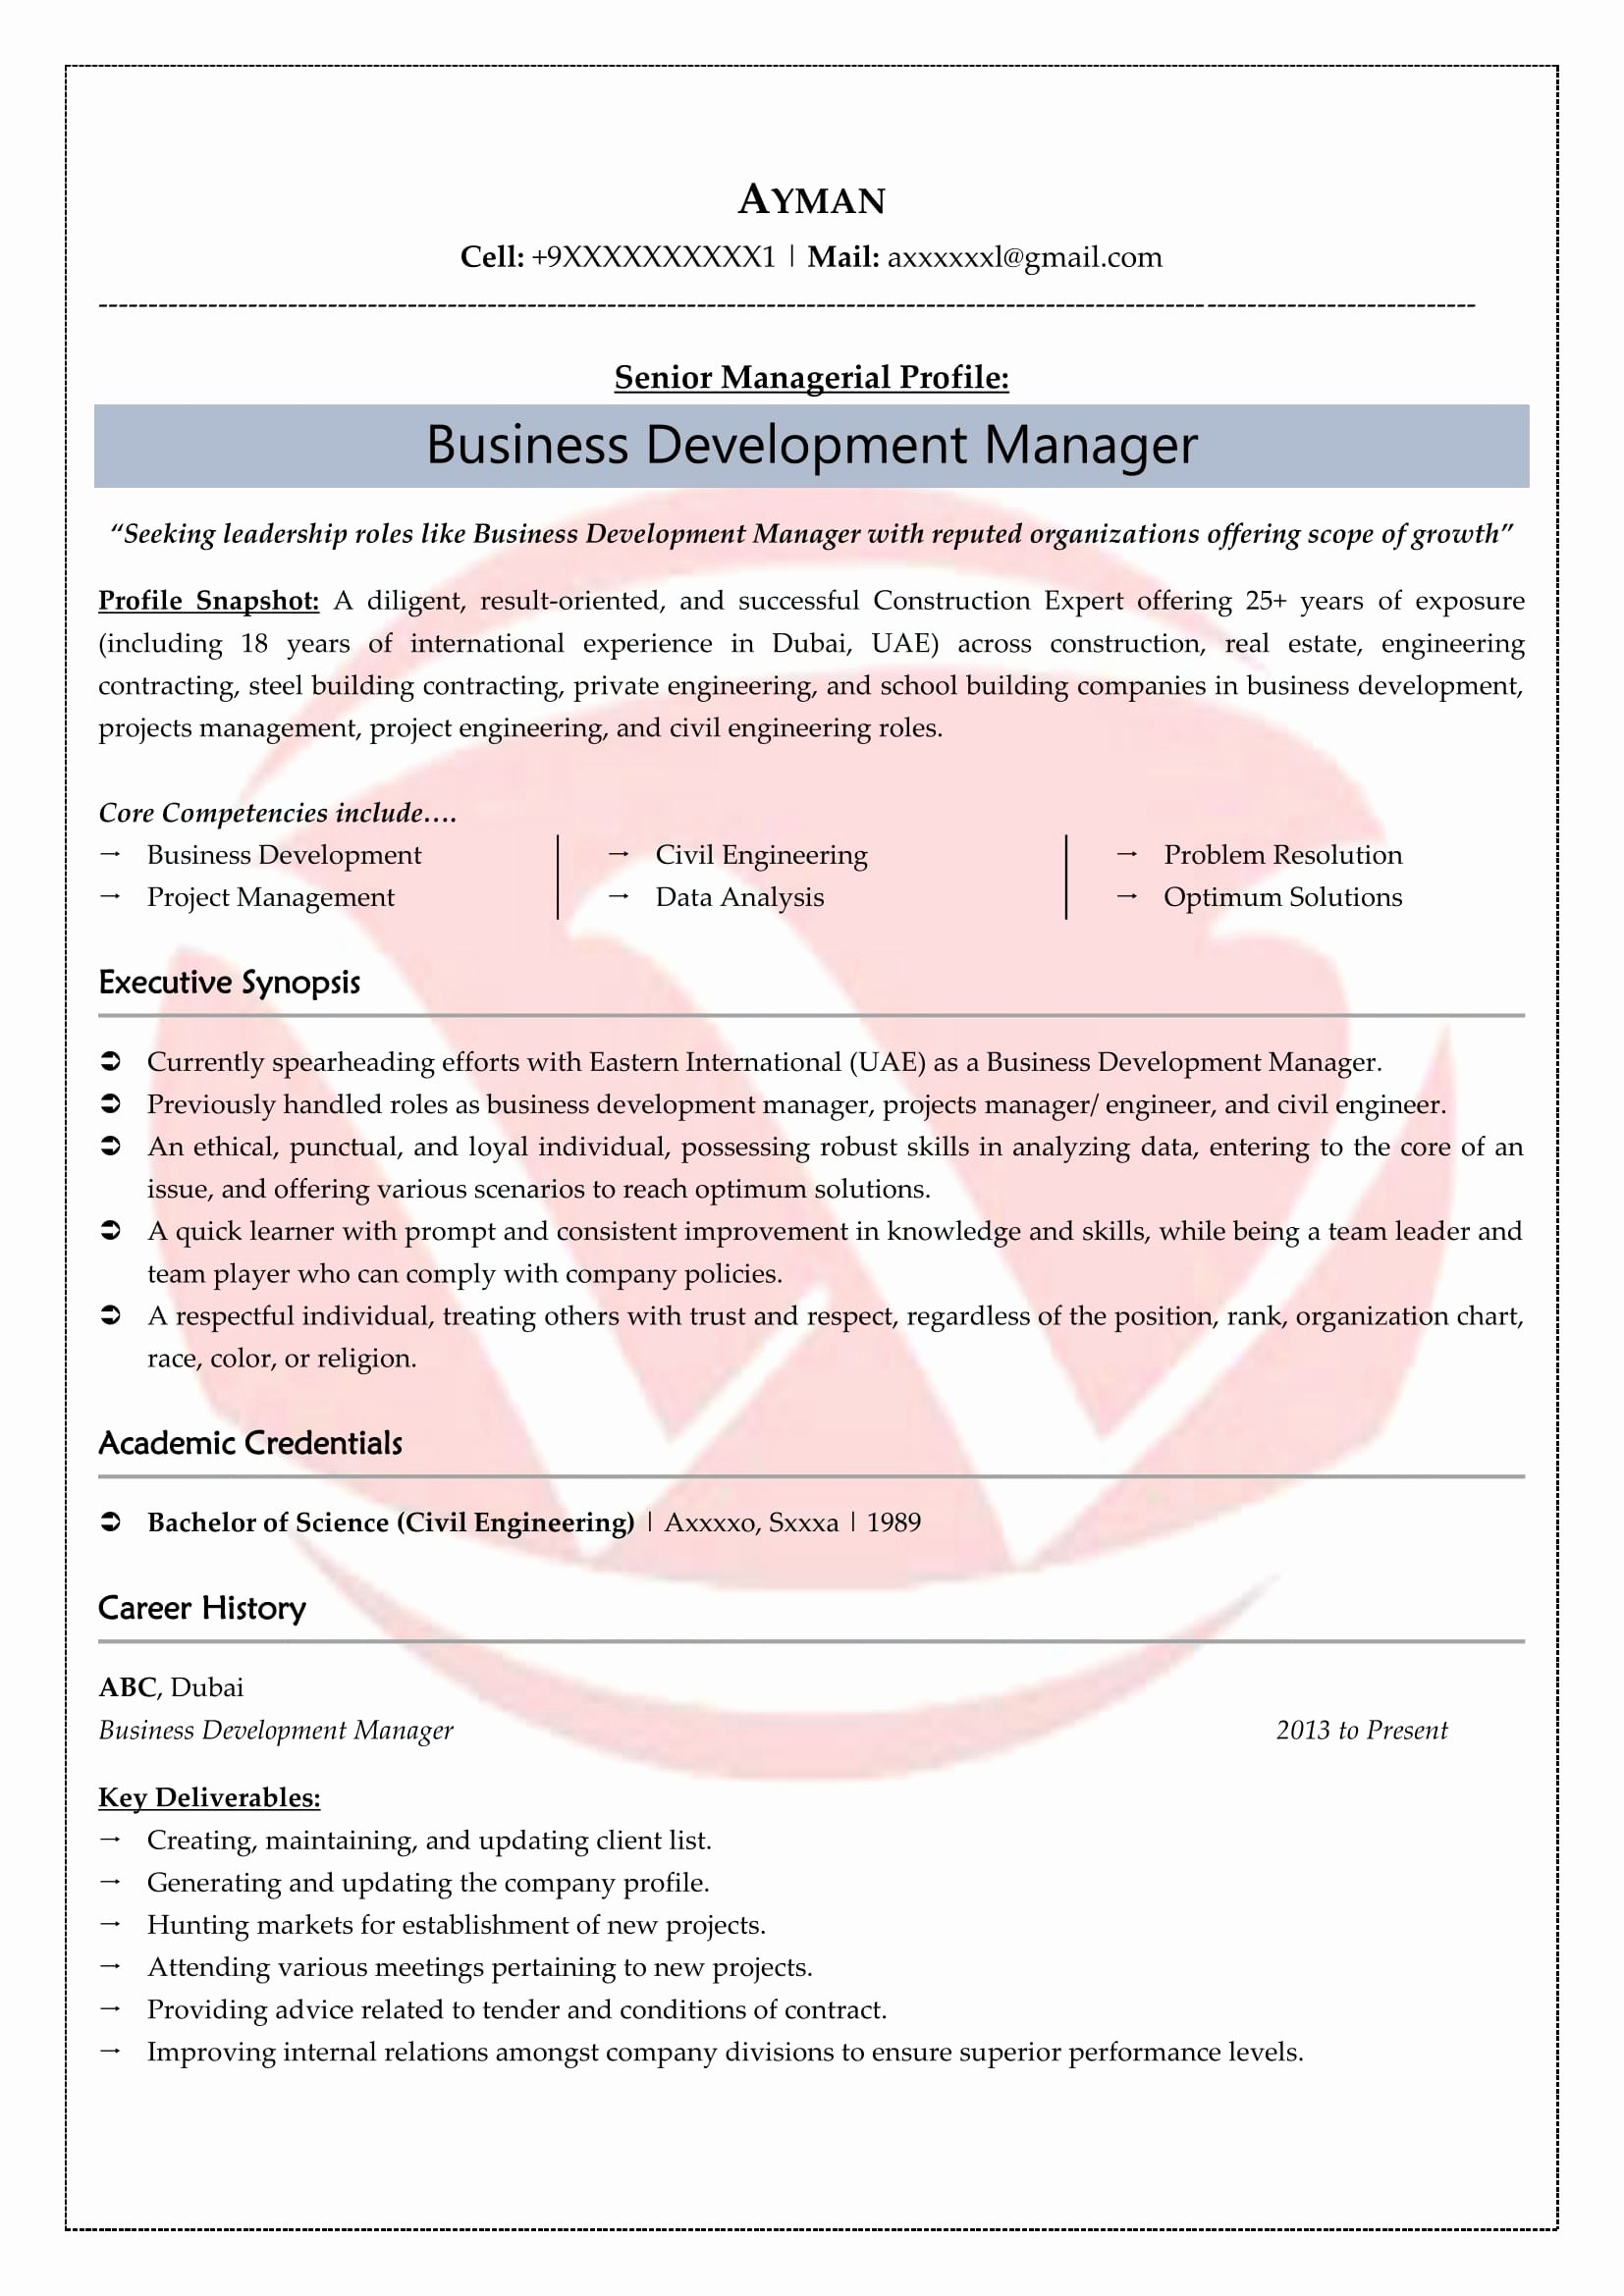 Business Development Manager Resume Inspirational Business Development Sample Resumes Download Resume